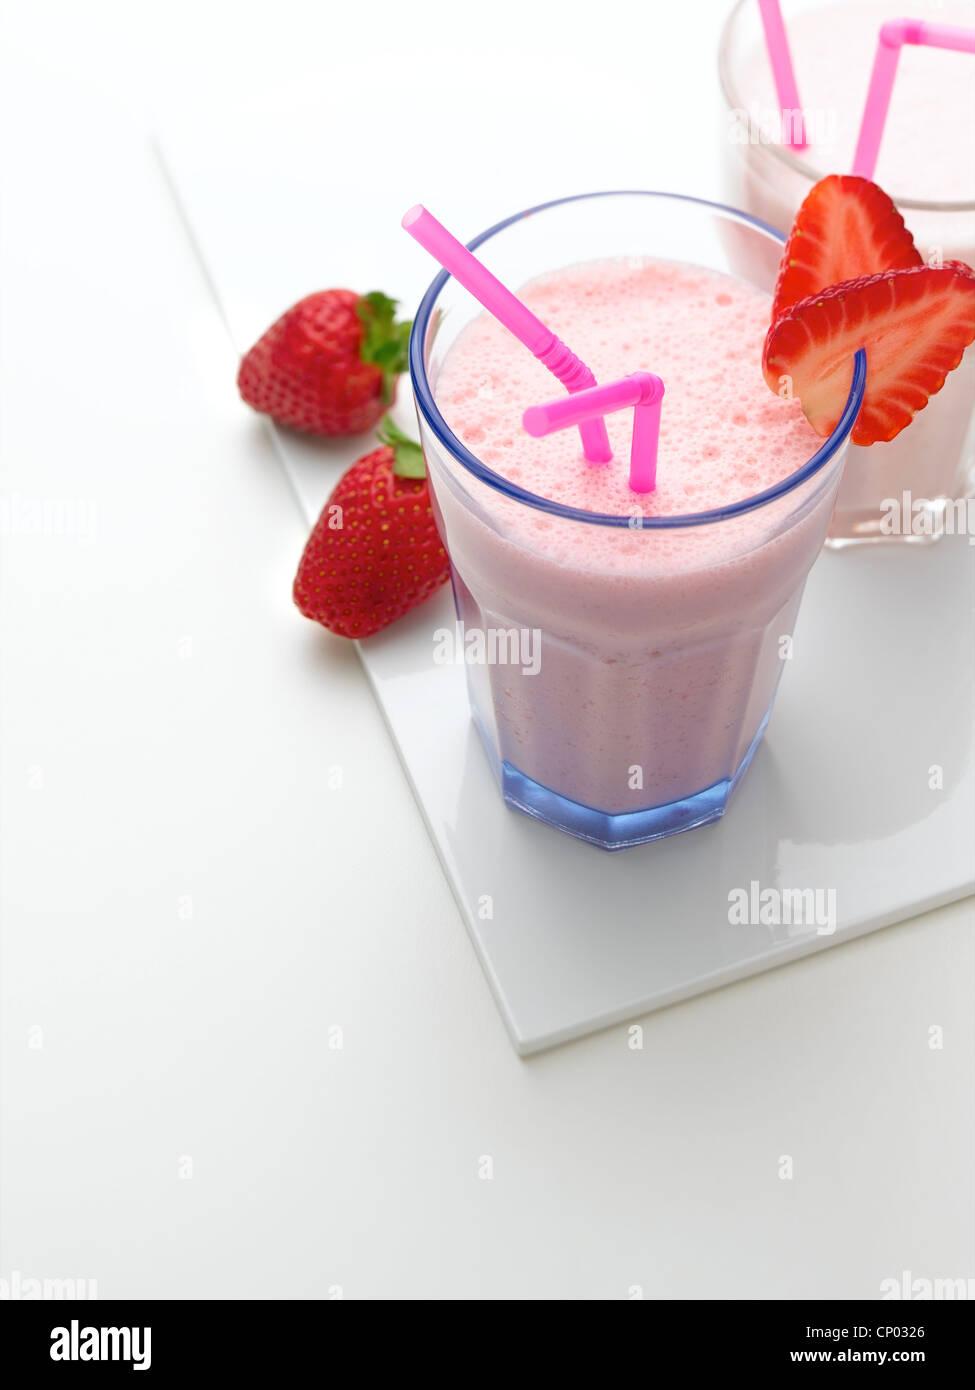 strawberry milkshake - Stock Image